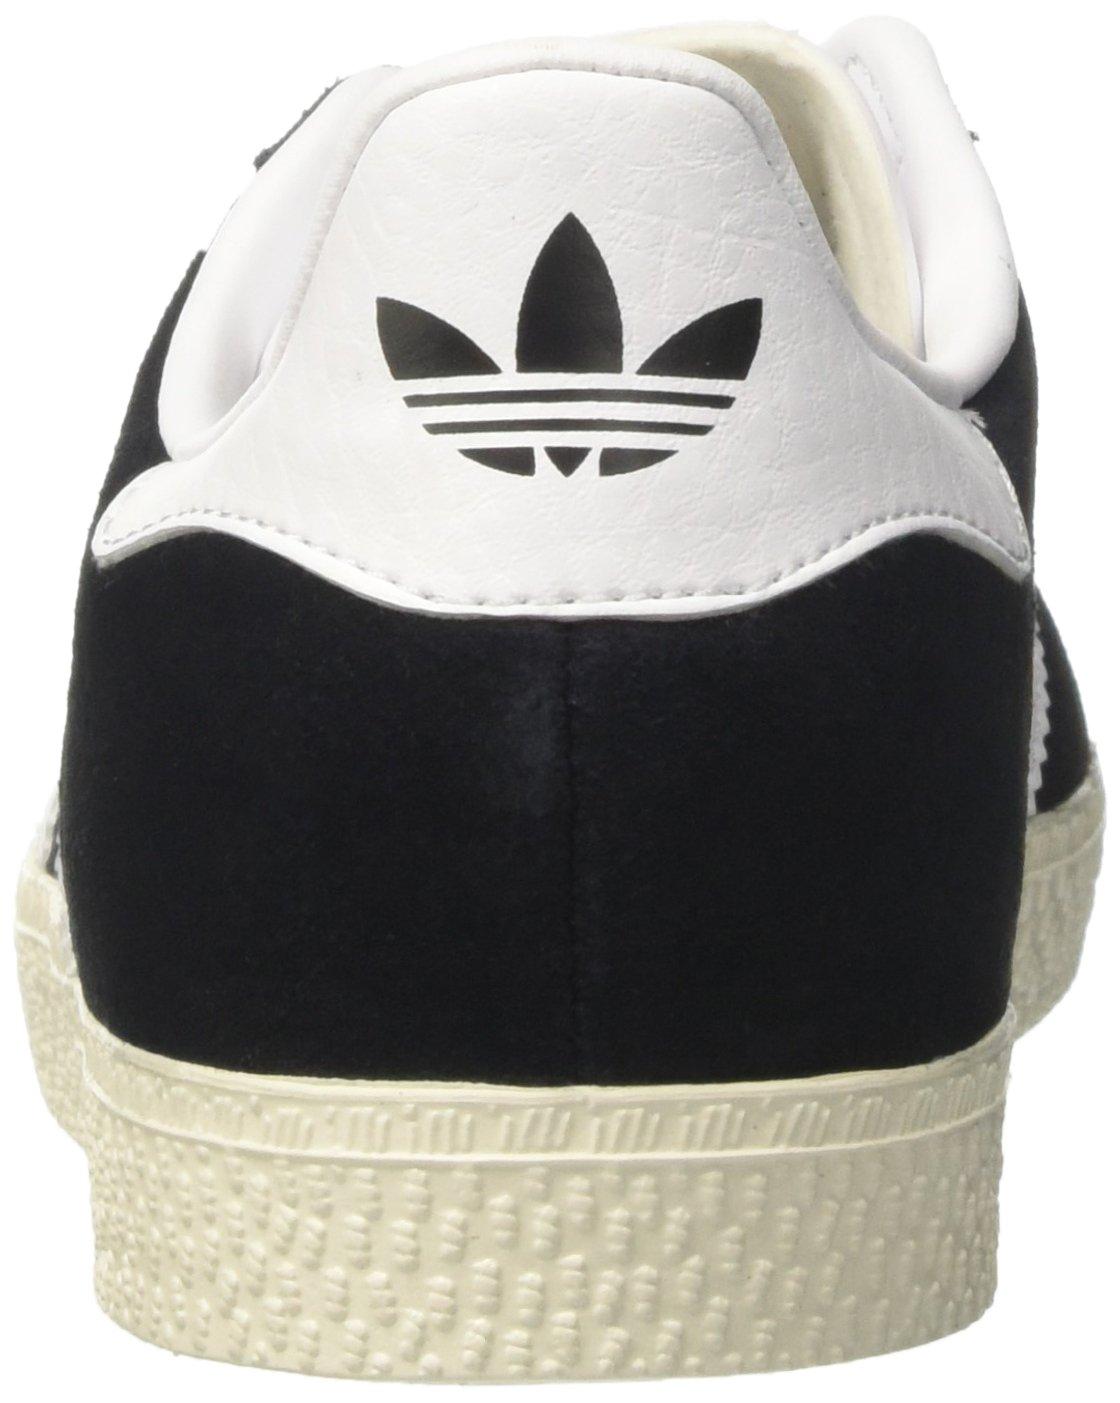 new product 7a9ea 3dfc3 Scarpe J Bambini Ginnastica Adidas Gazelle Nero Unisex Basse Ebay Da 5q0xExT